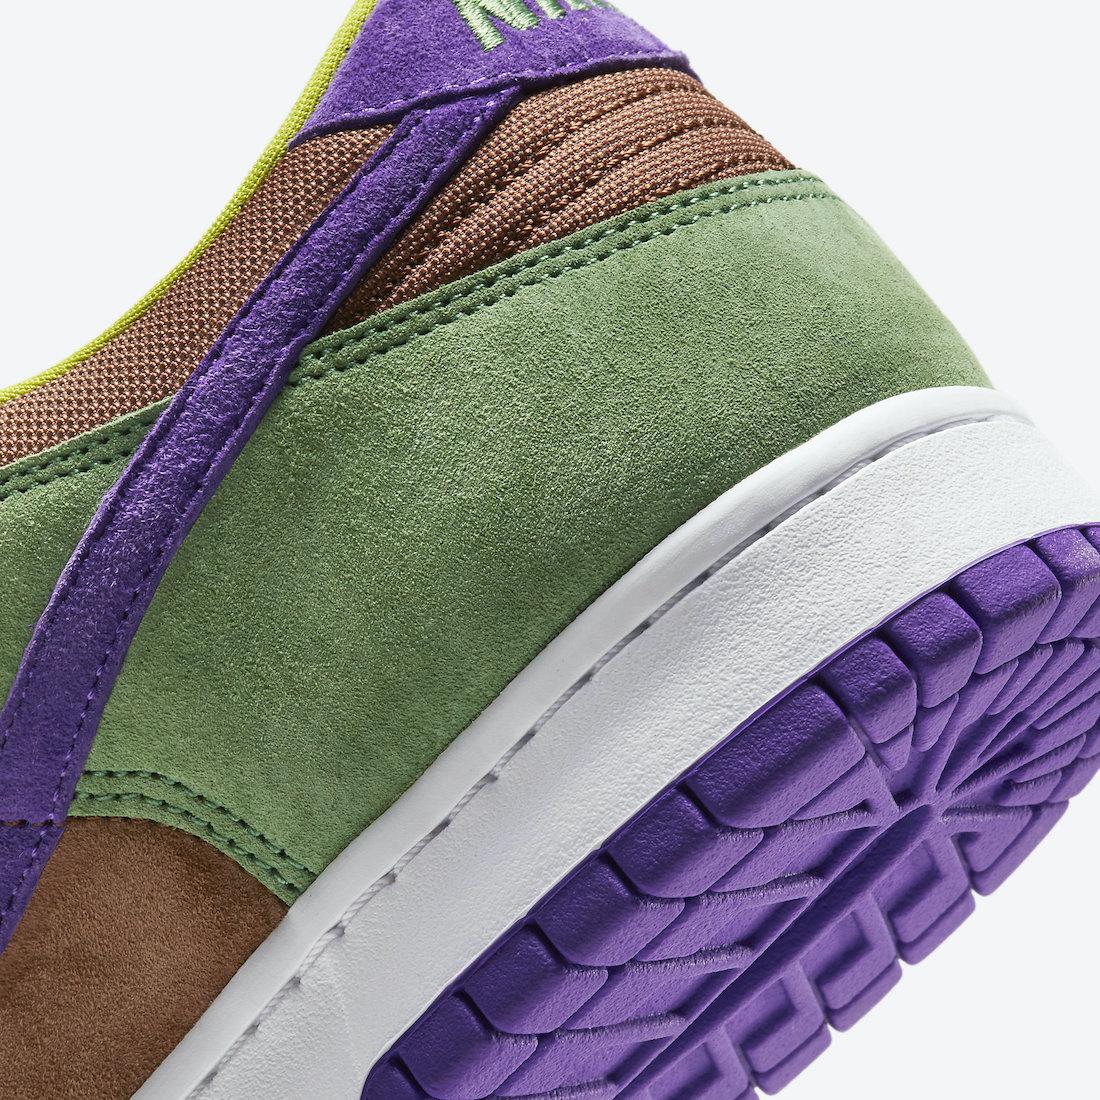 Nike-Dunk-Veneer-DA1469-200-Release-Date-Price-7